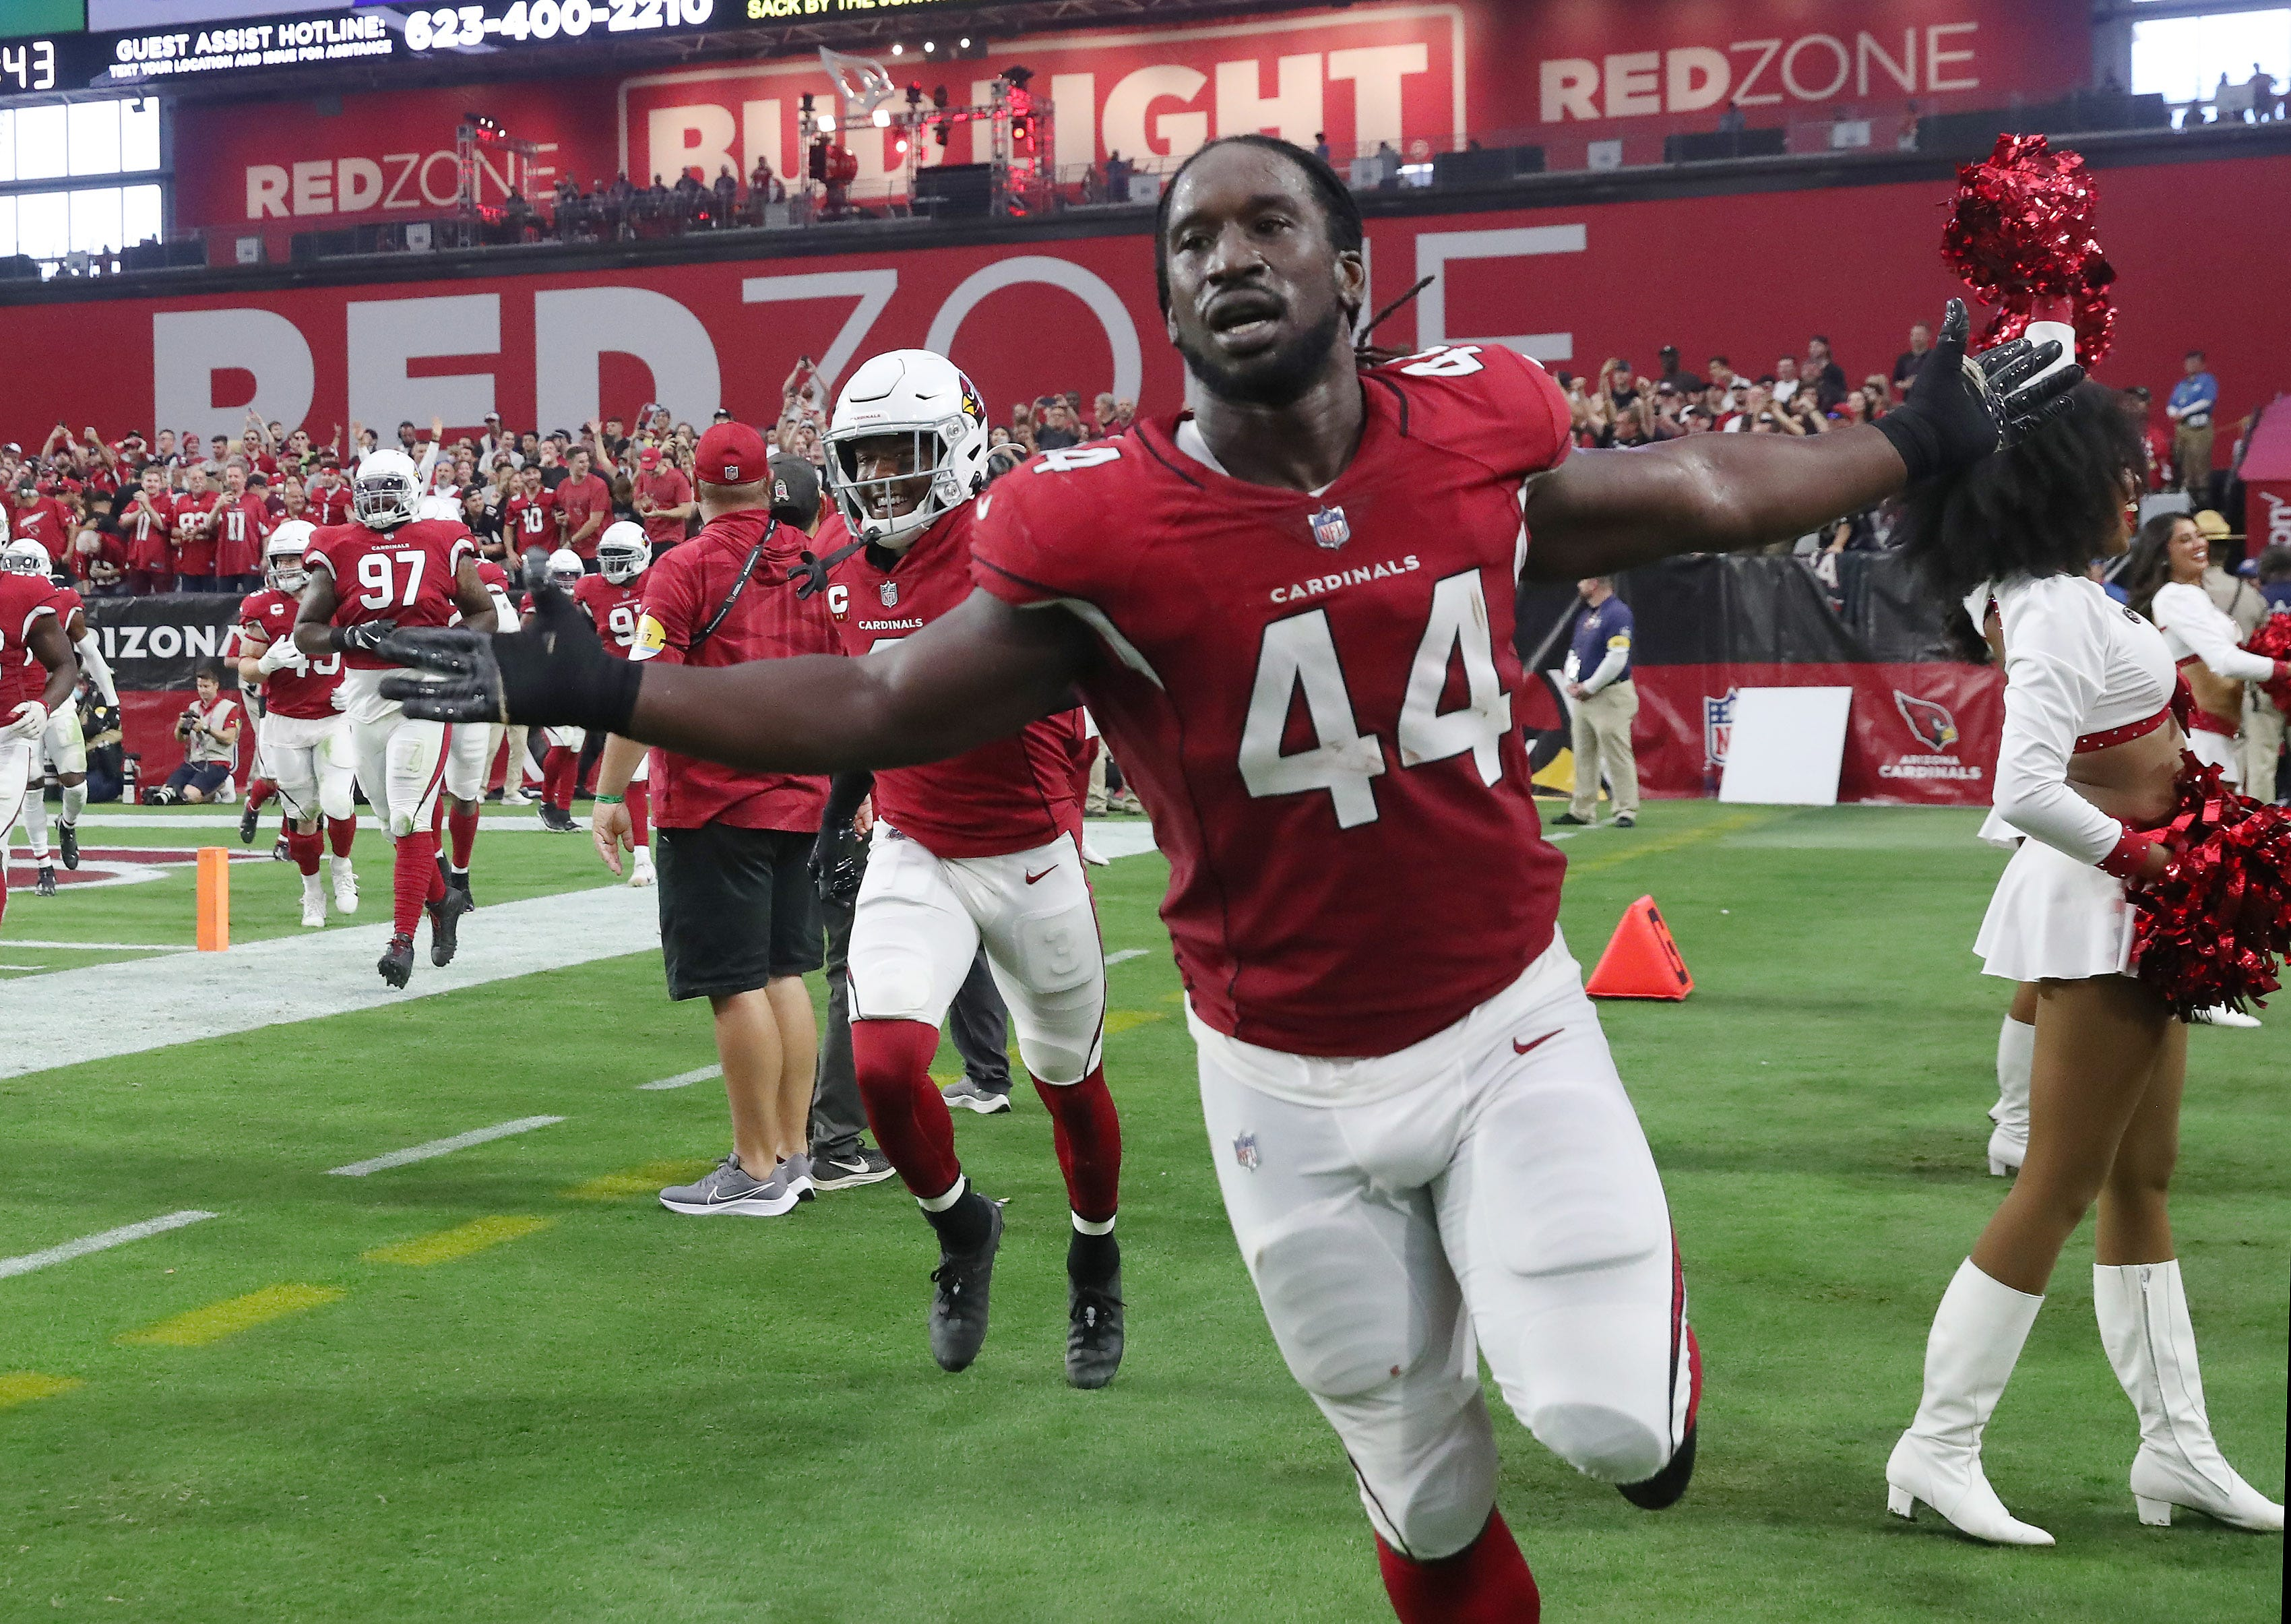 Cardinals-Texans rewind: Arizona rolls over Houston to stay unbeaten